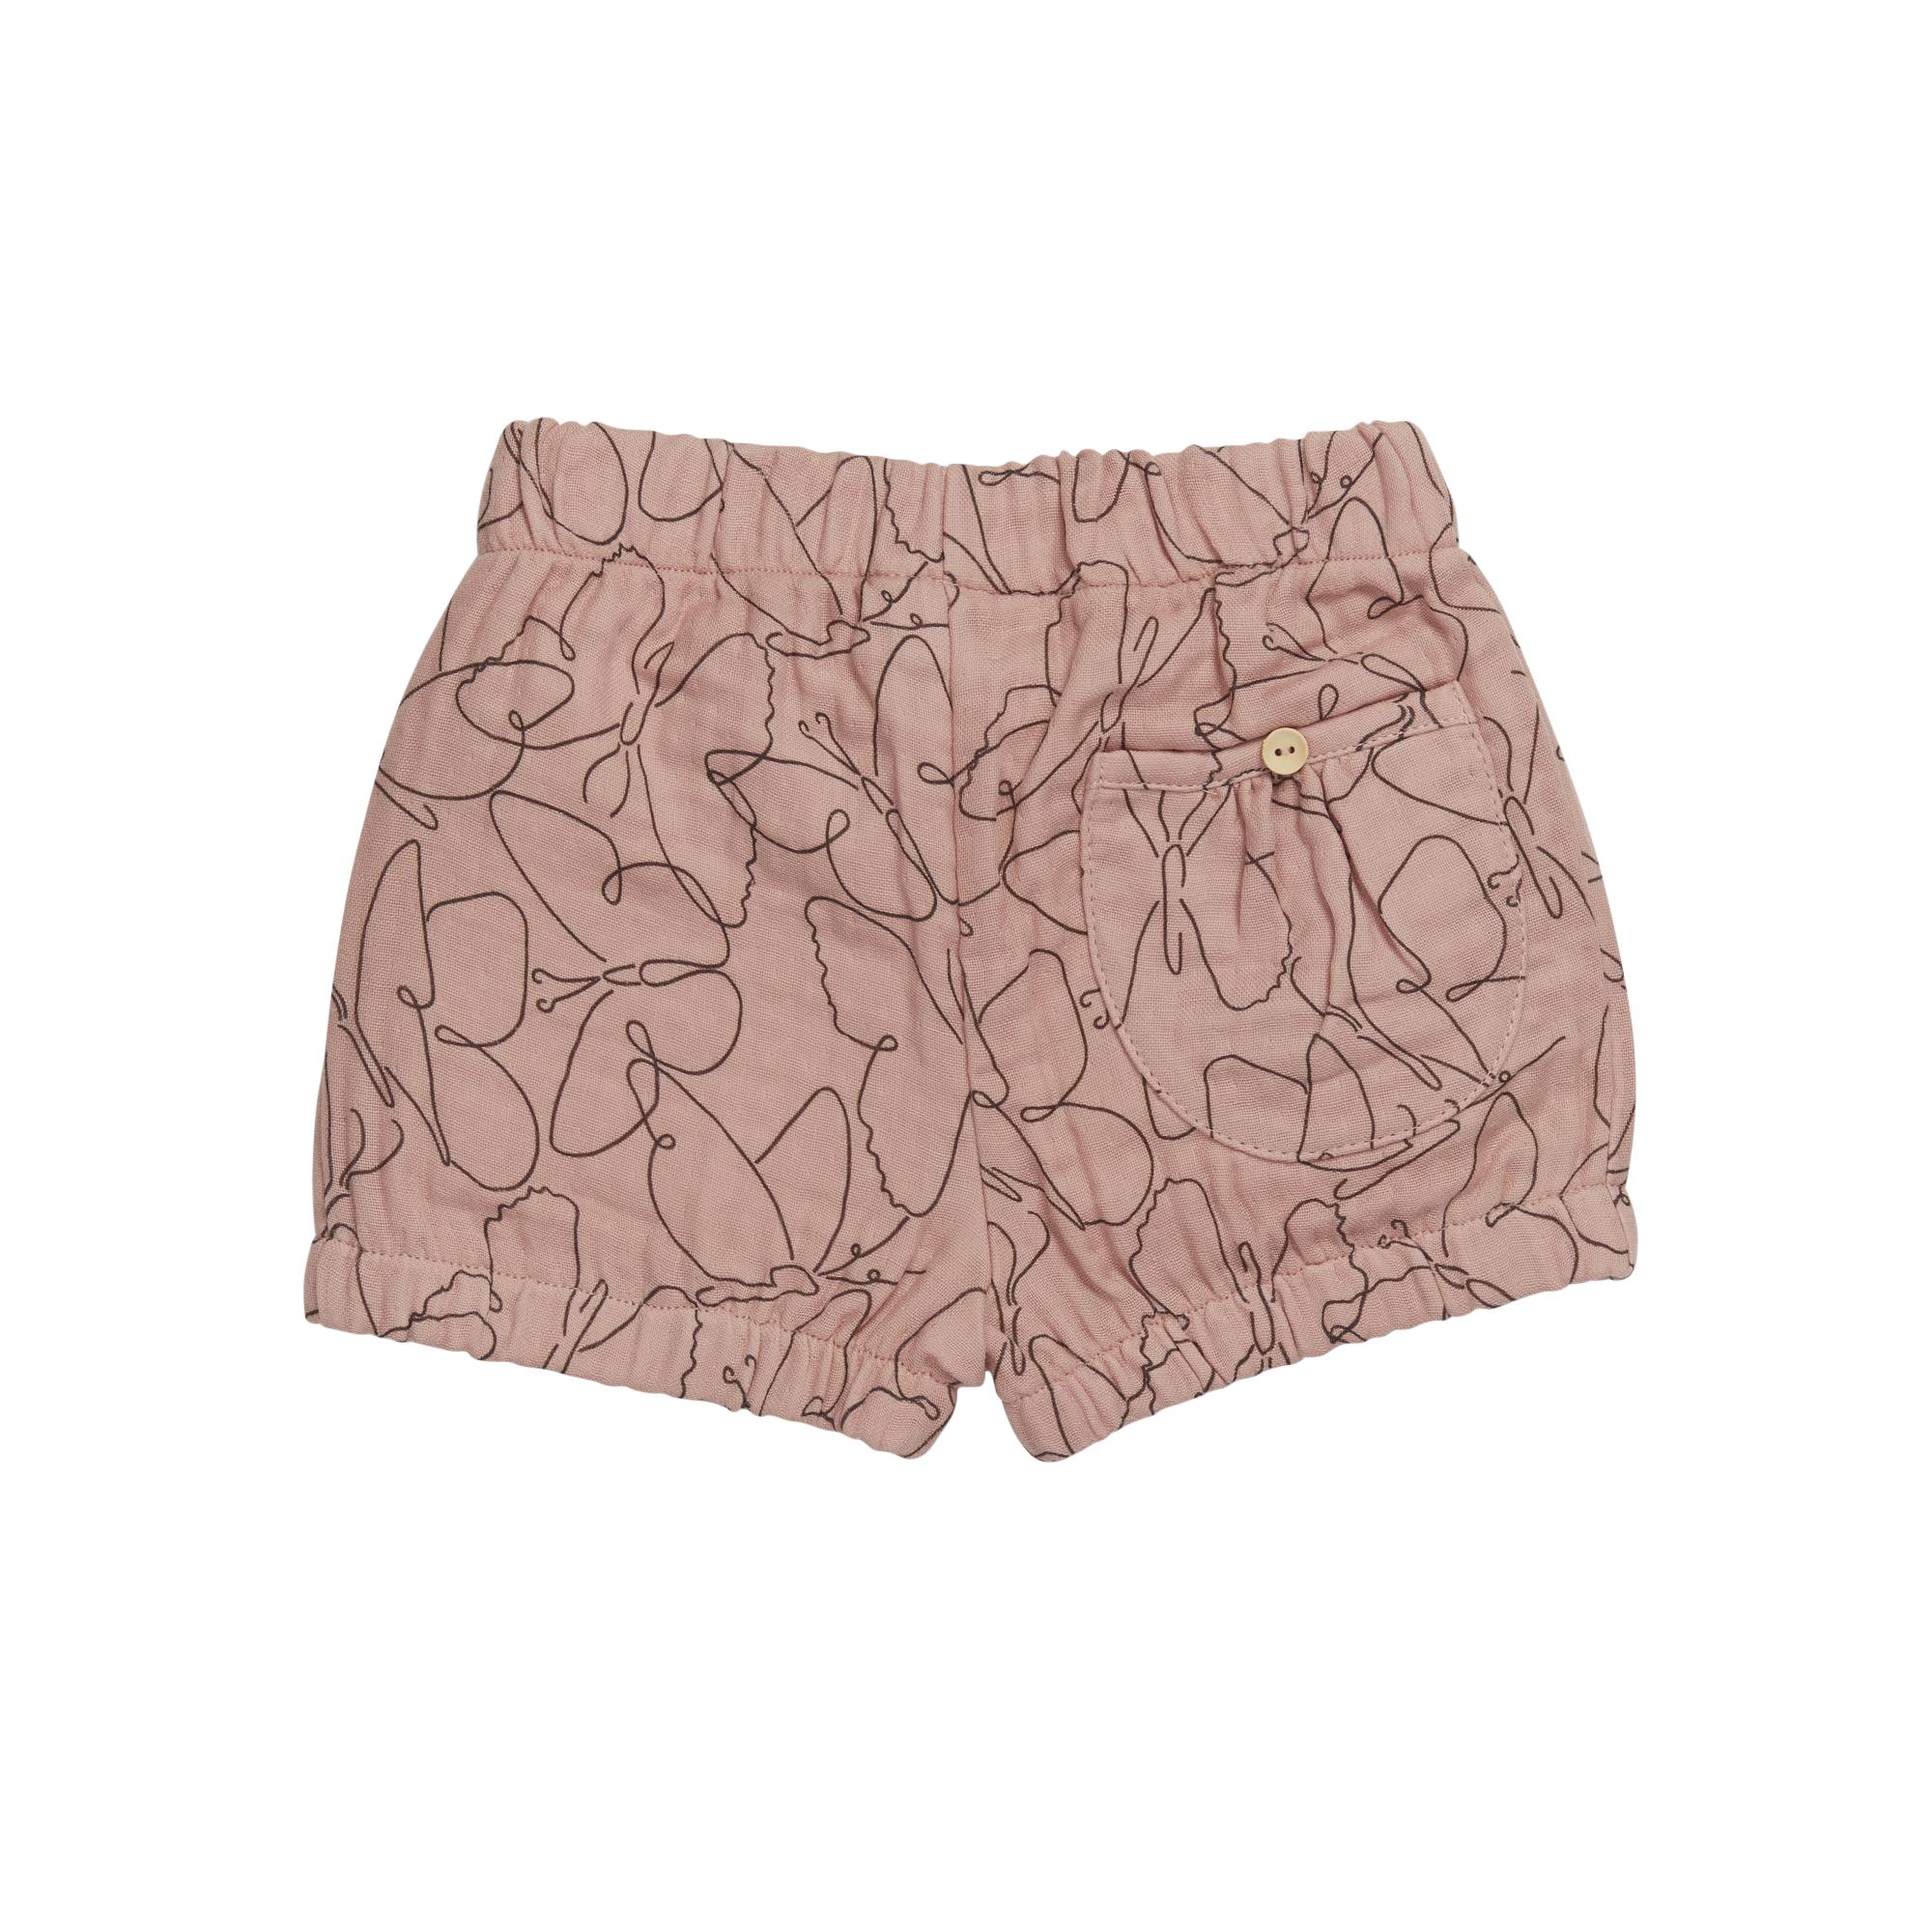 Shorts muslin Butterfly Dream - Powder-3